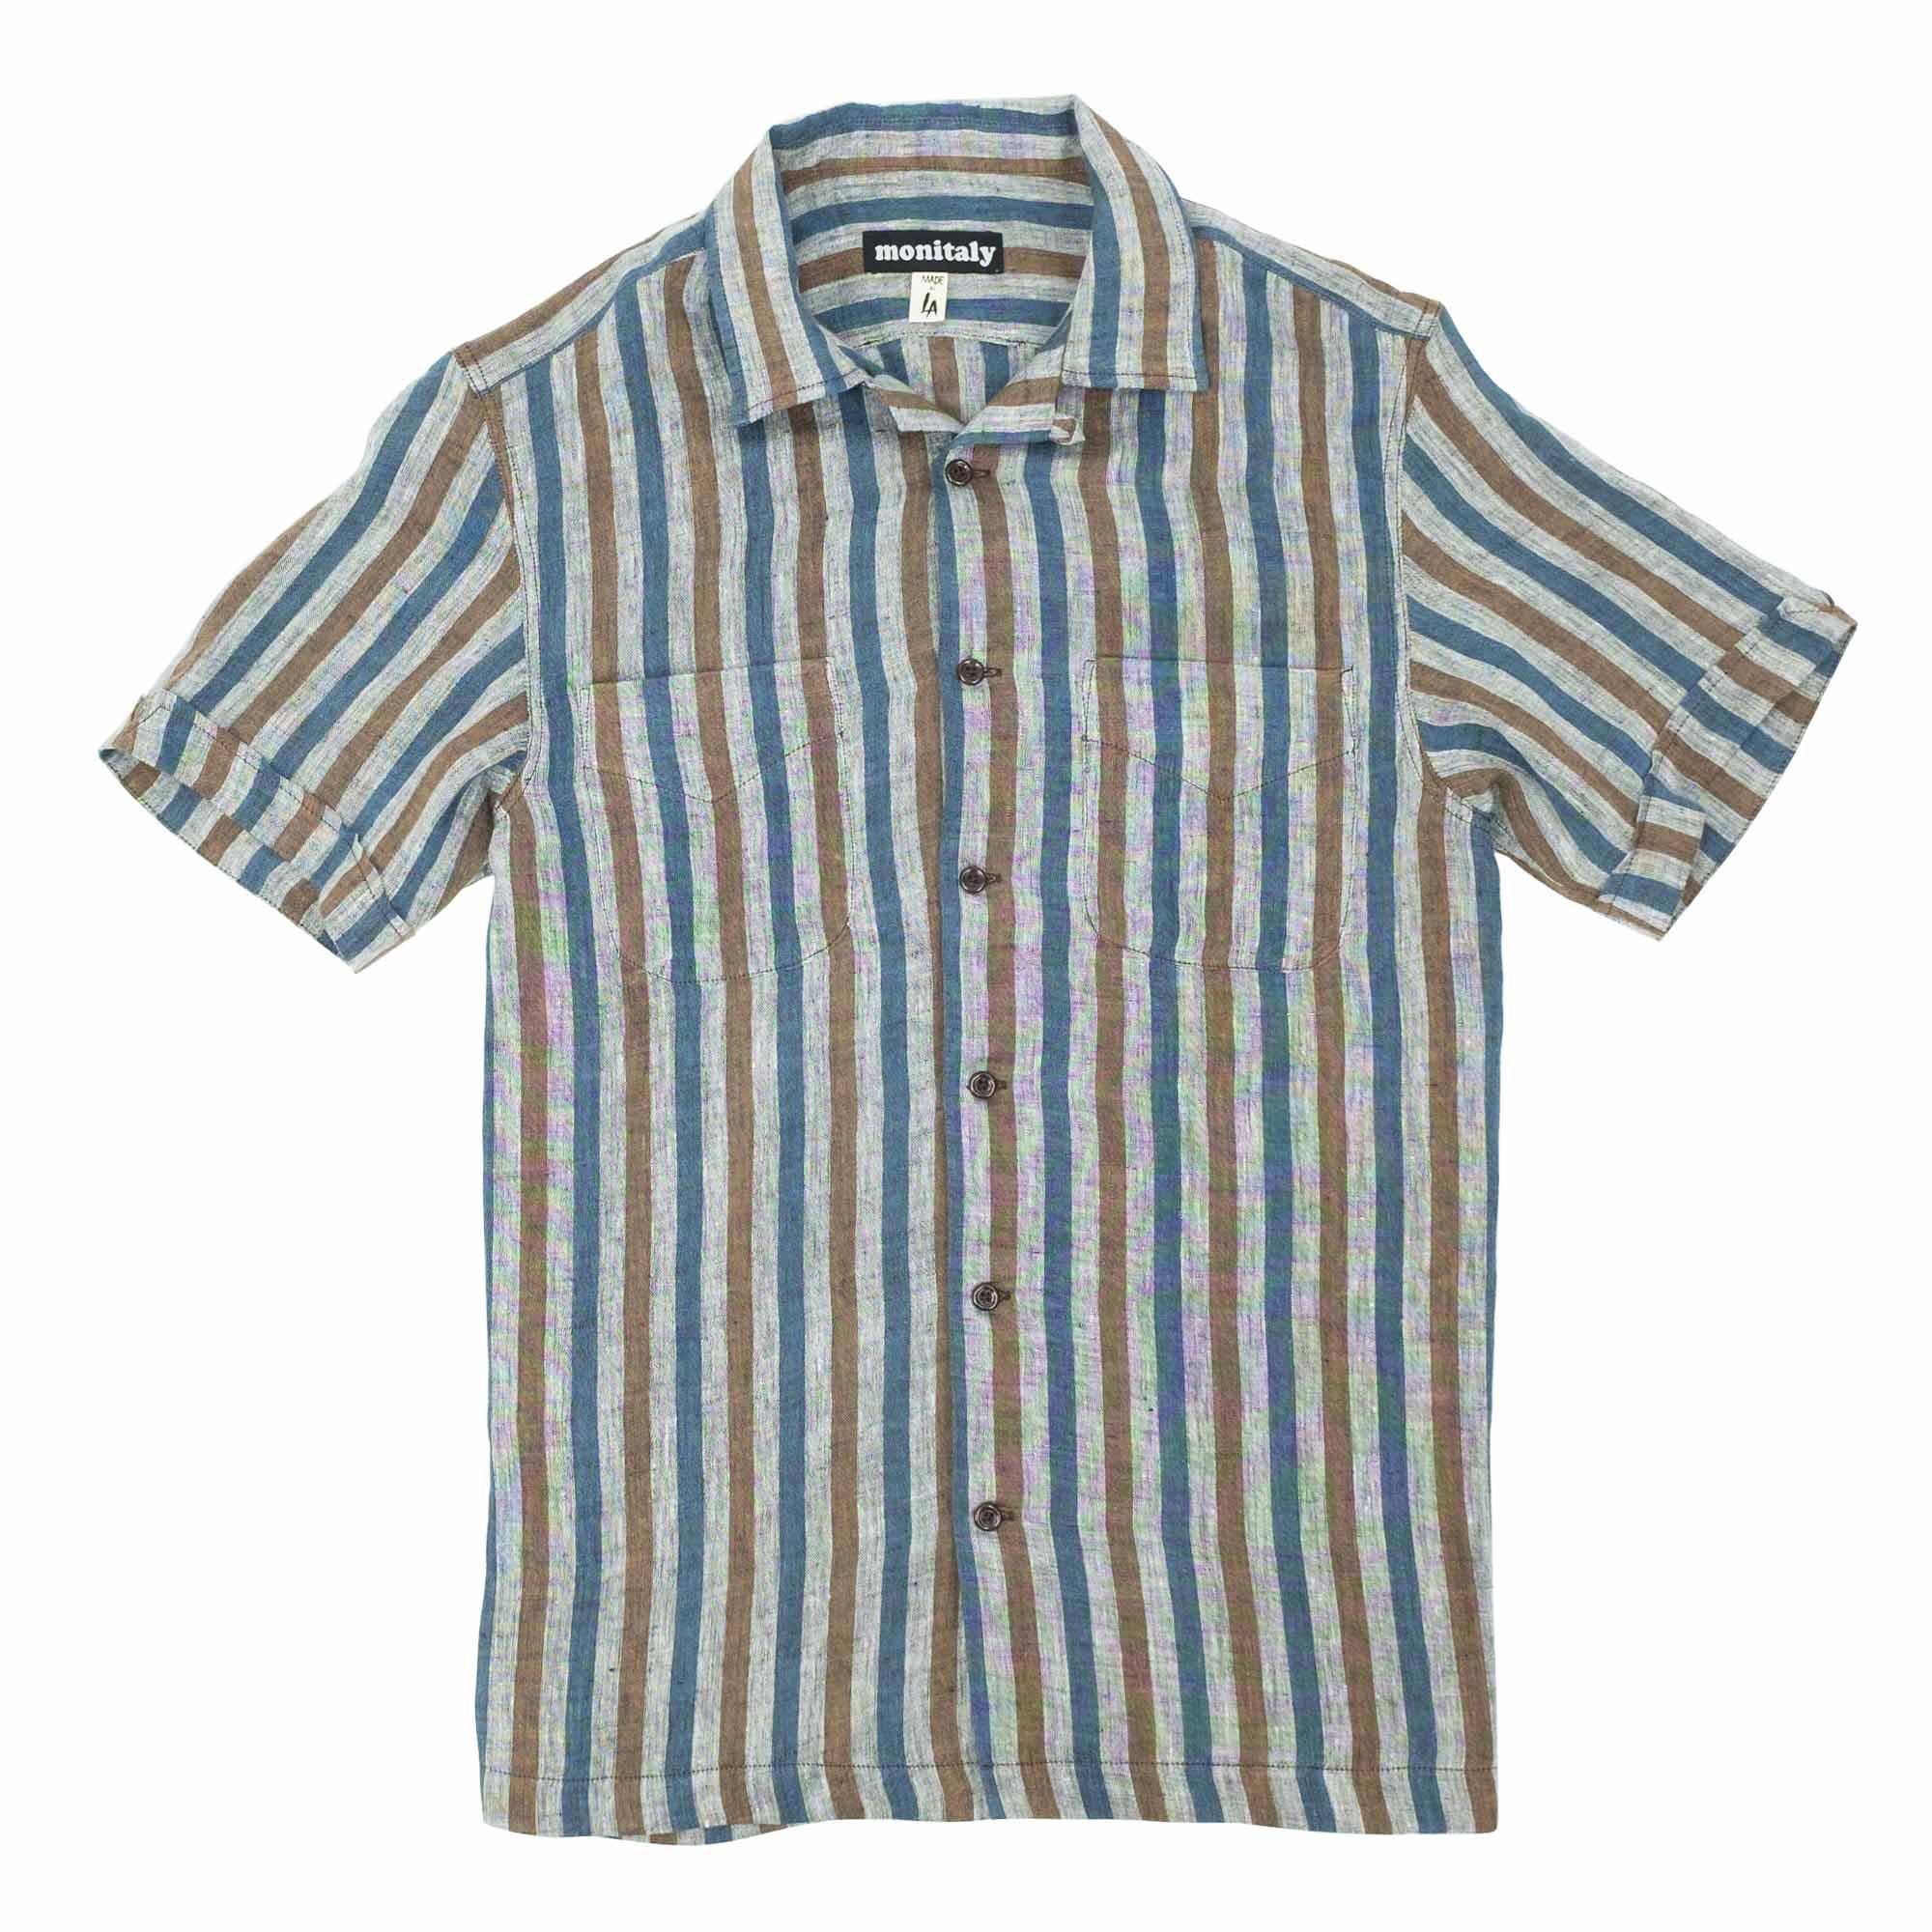 Monitaly Vacation Shirt - Lt Linen Stripe